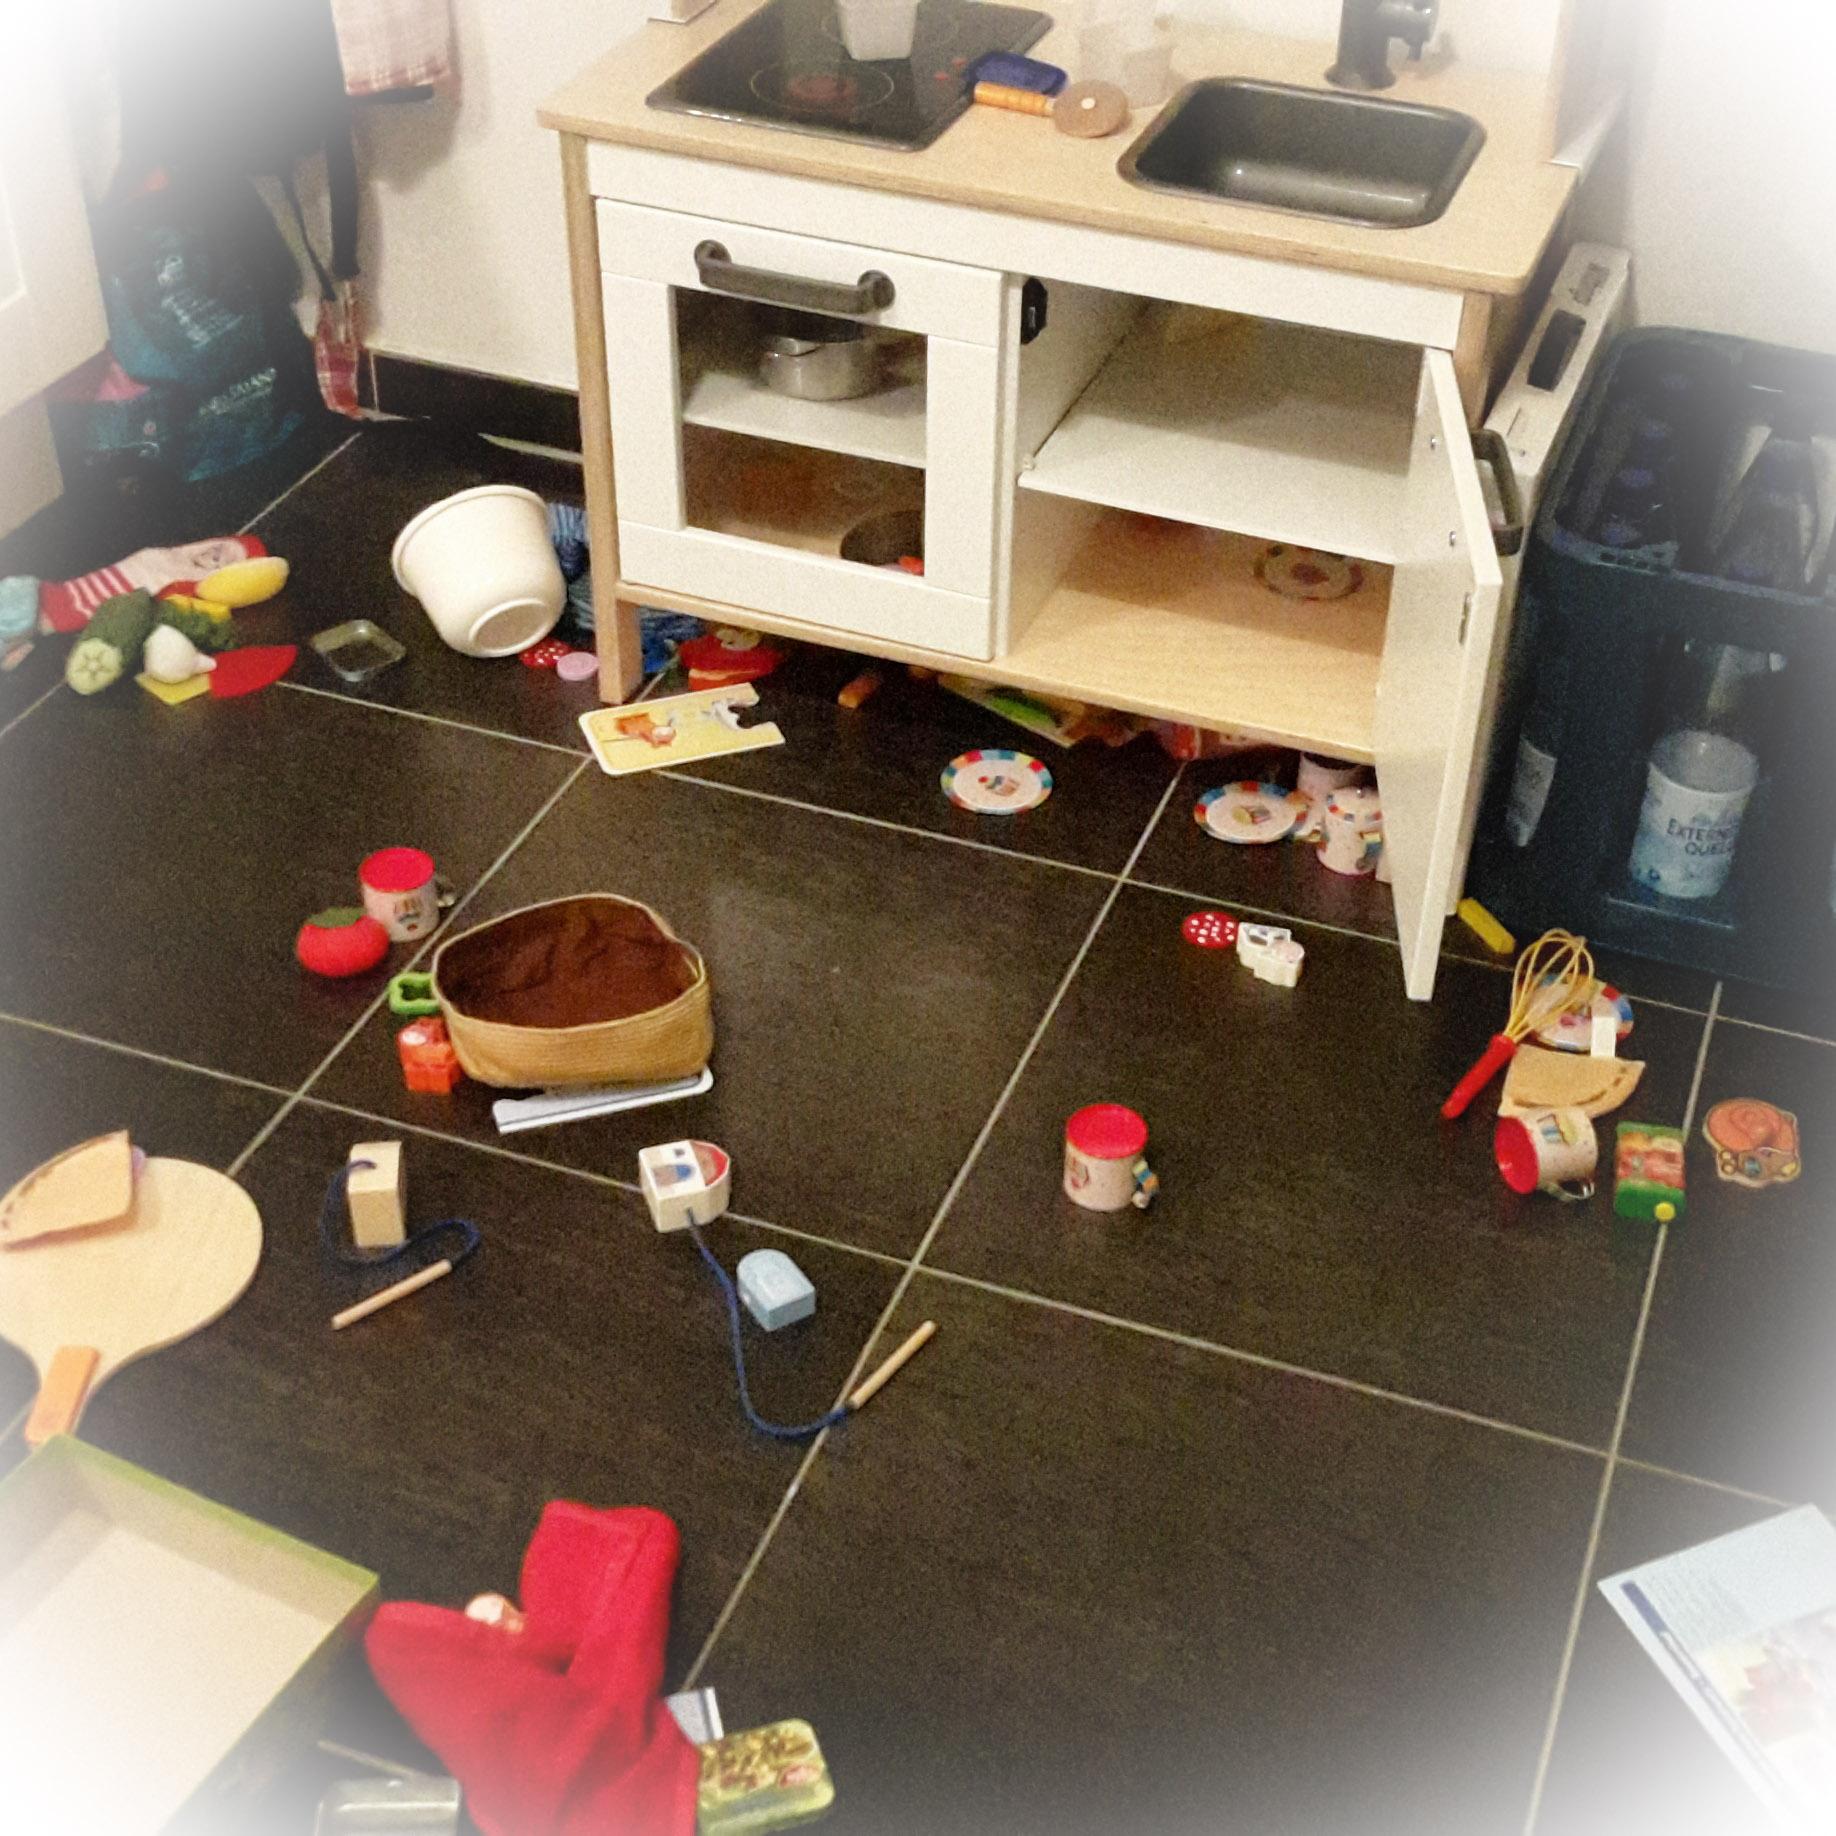 2015 januar Â« chaos² – familienwahnsinn im doppelpack